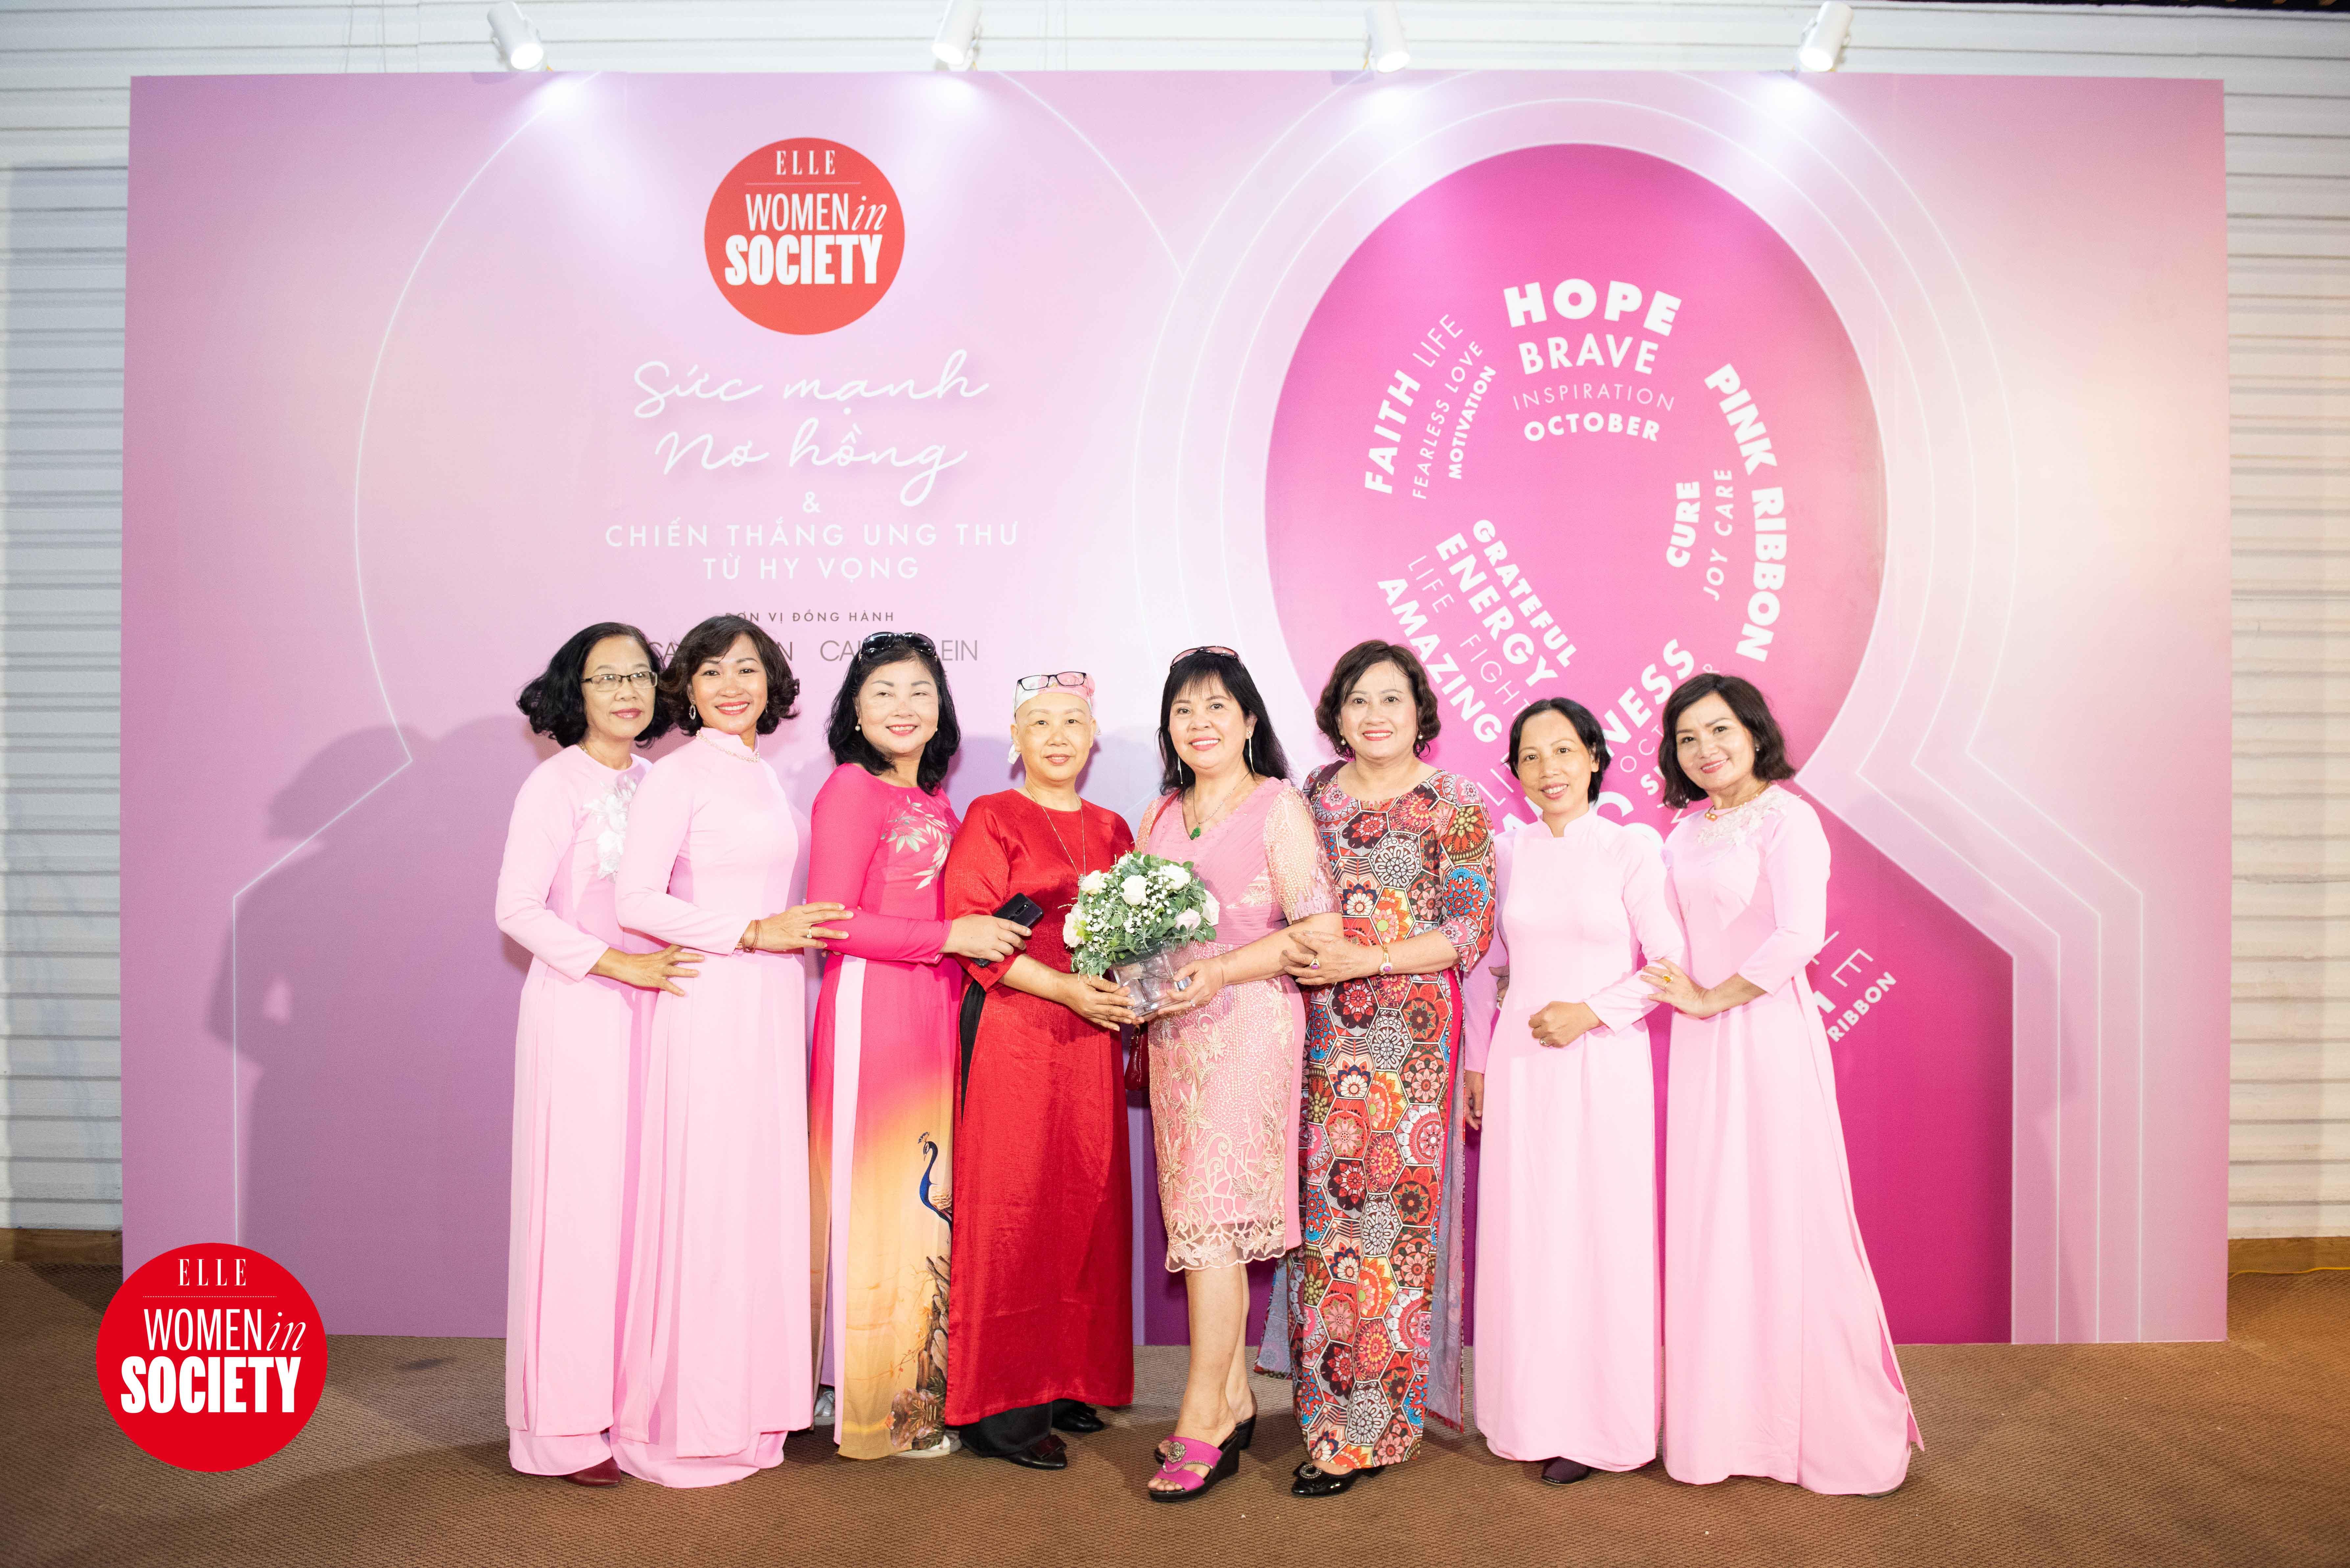 khách tham dự elle women in society 2019